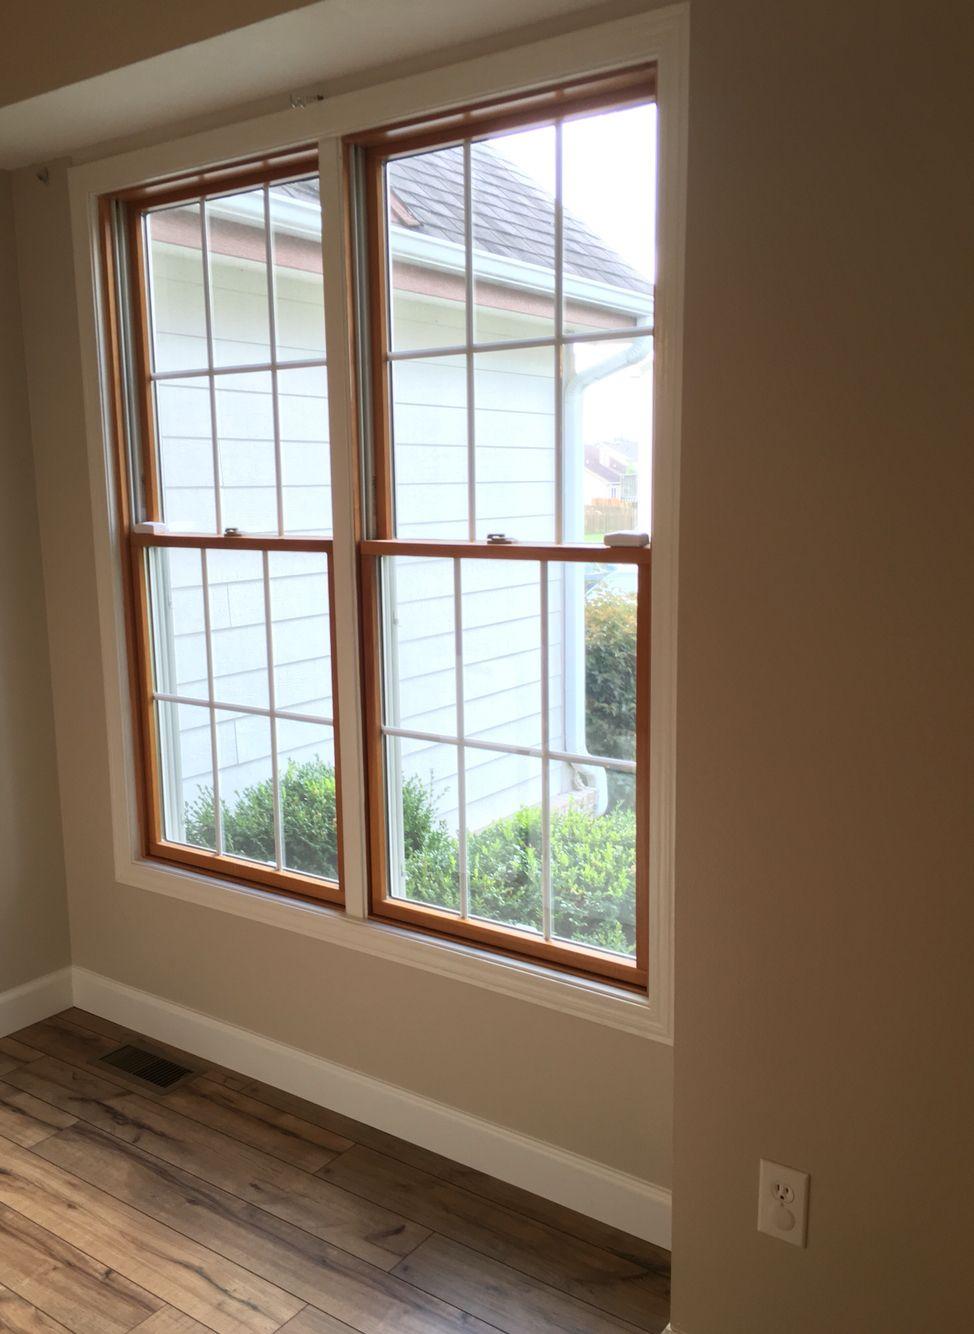 Wood windows, white trim. Shaw laminate floor in